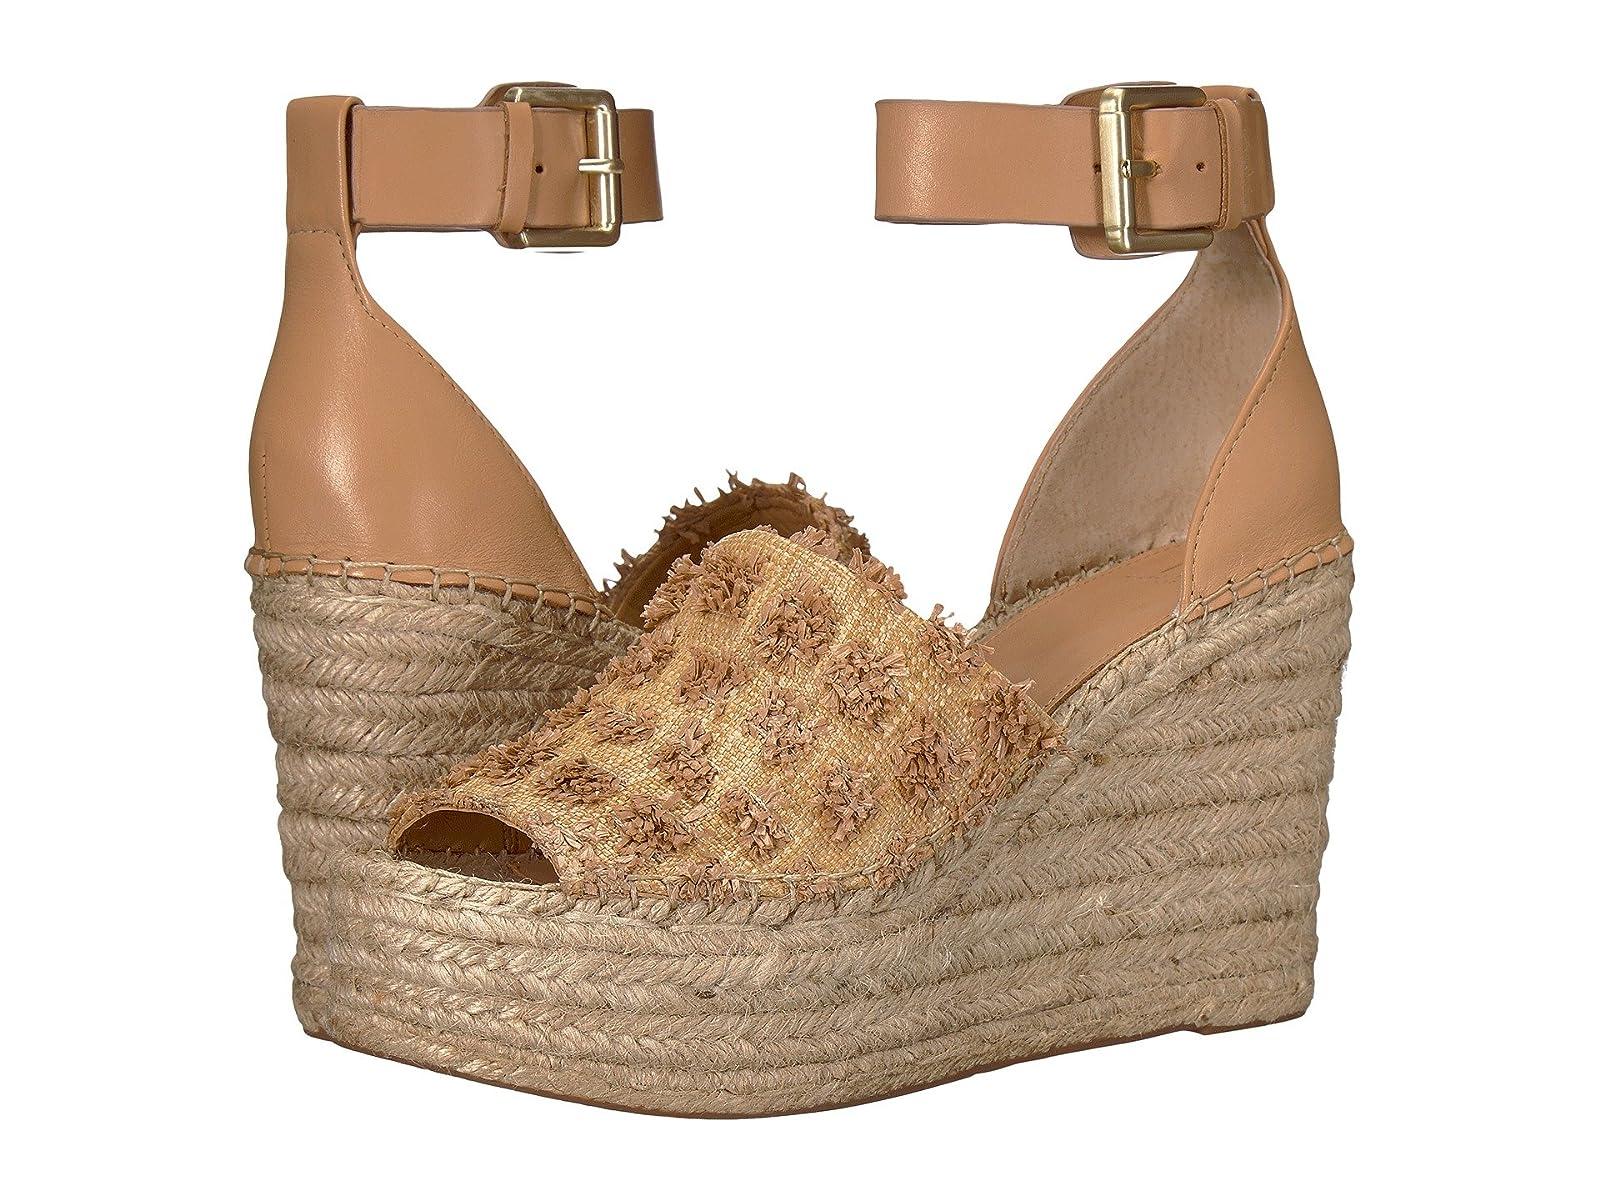 Marc Fisher LTD Adalyn Espadrille WedgeAtmospheric grades have affordable shoes